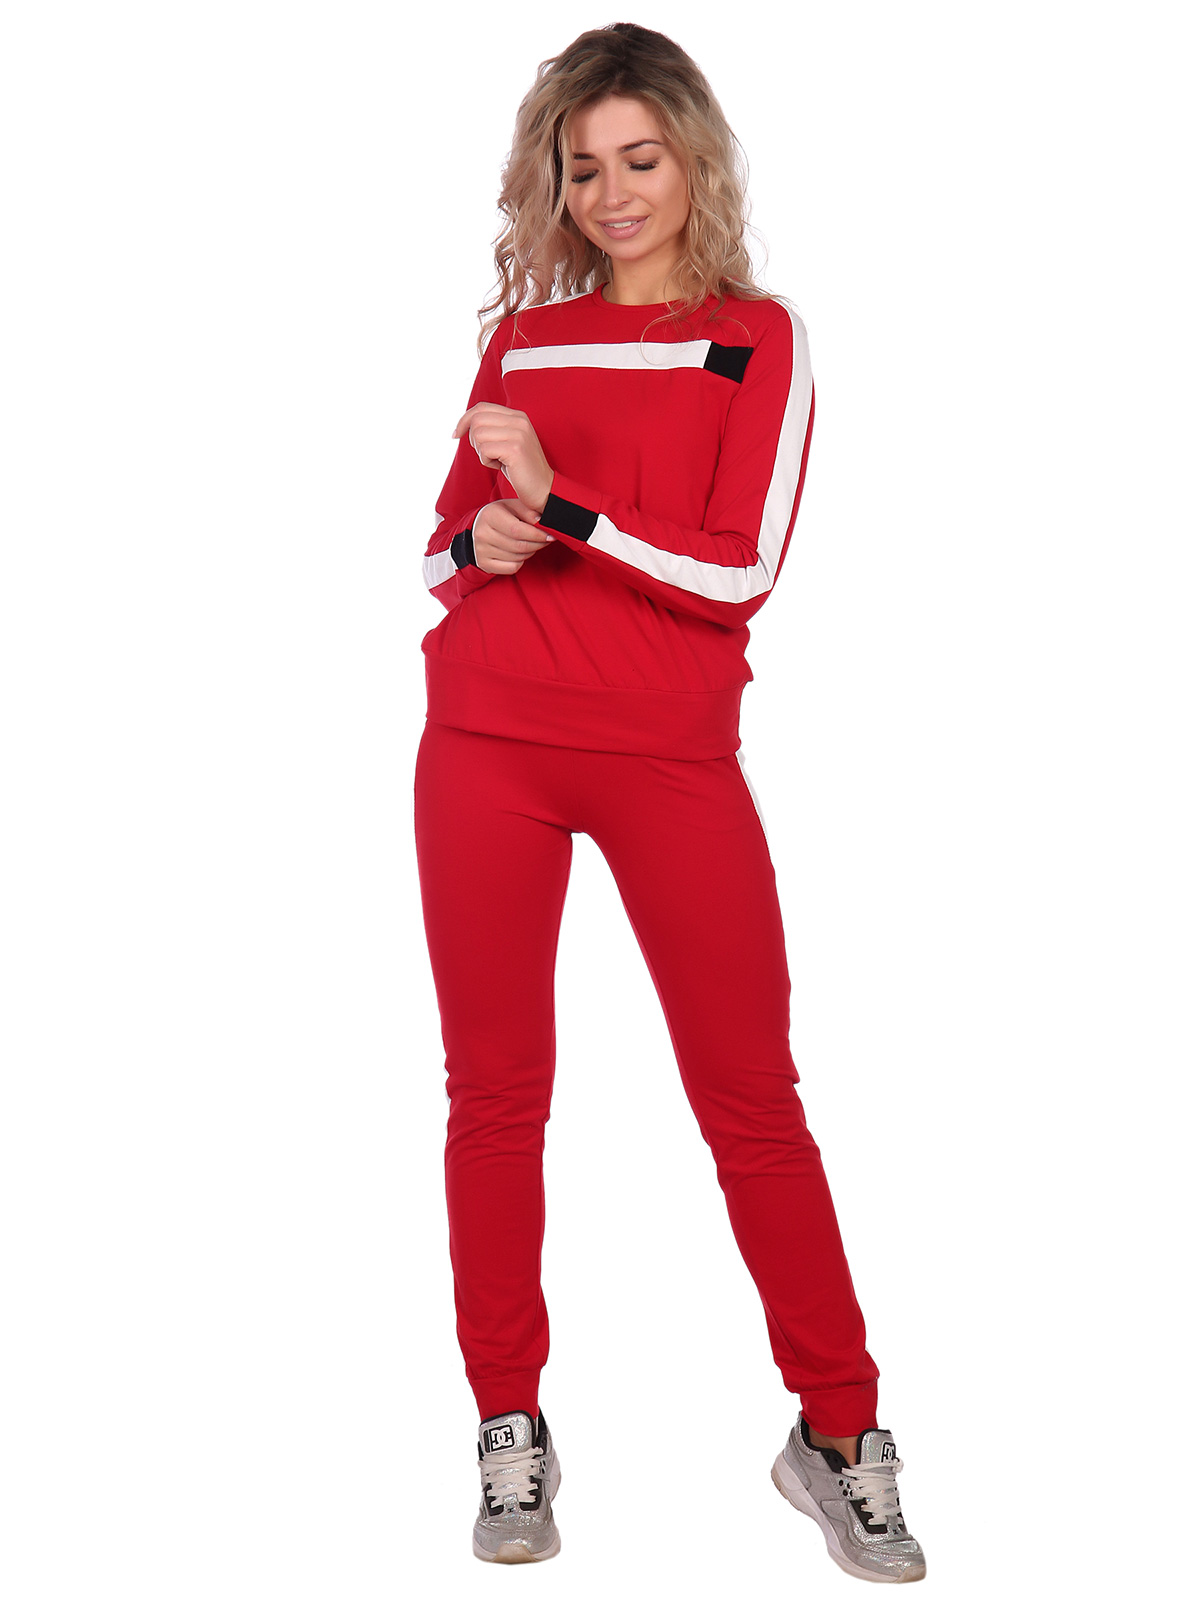 Жен. костюм арт. 16-0668 Красный р. 54 НСД Трикотаж